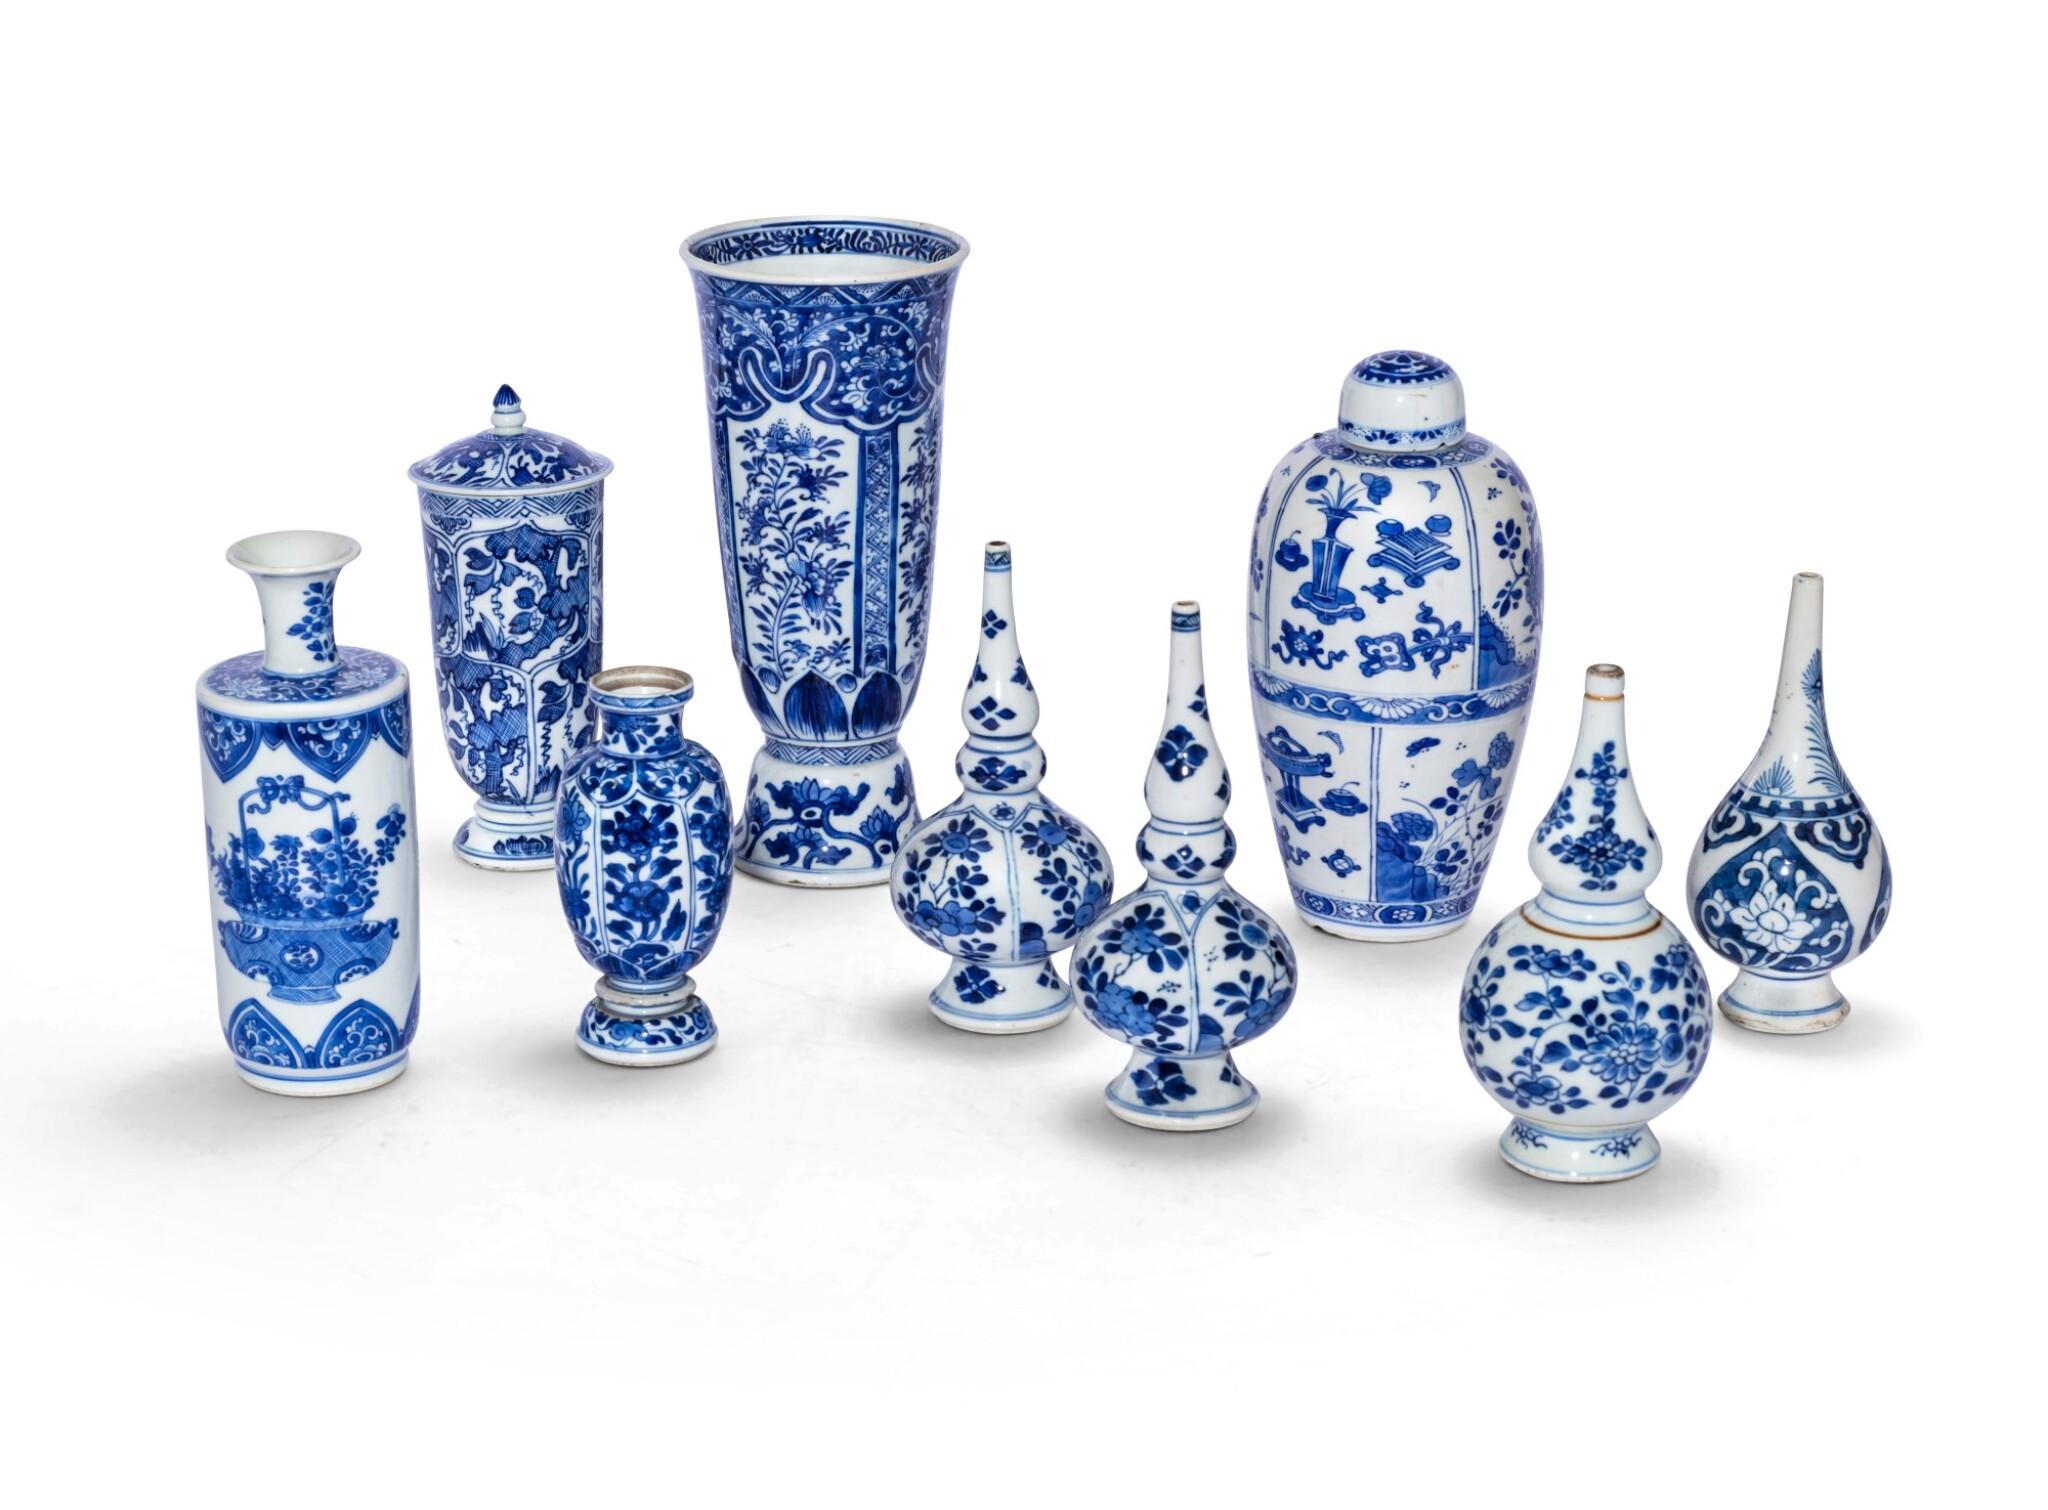 View 1 of Lot 186. Ensemble de neuf vases en porcelaine bleu blanc Dynastie Qing, XVIIIE siècle   清十八世紀 青花花瓶 一組九件   A group of nine blue and white vases, Qing Dynasty, 18th century.